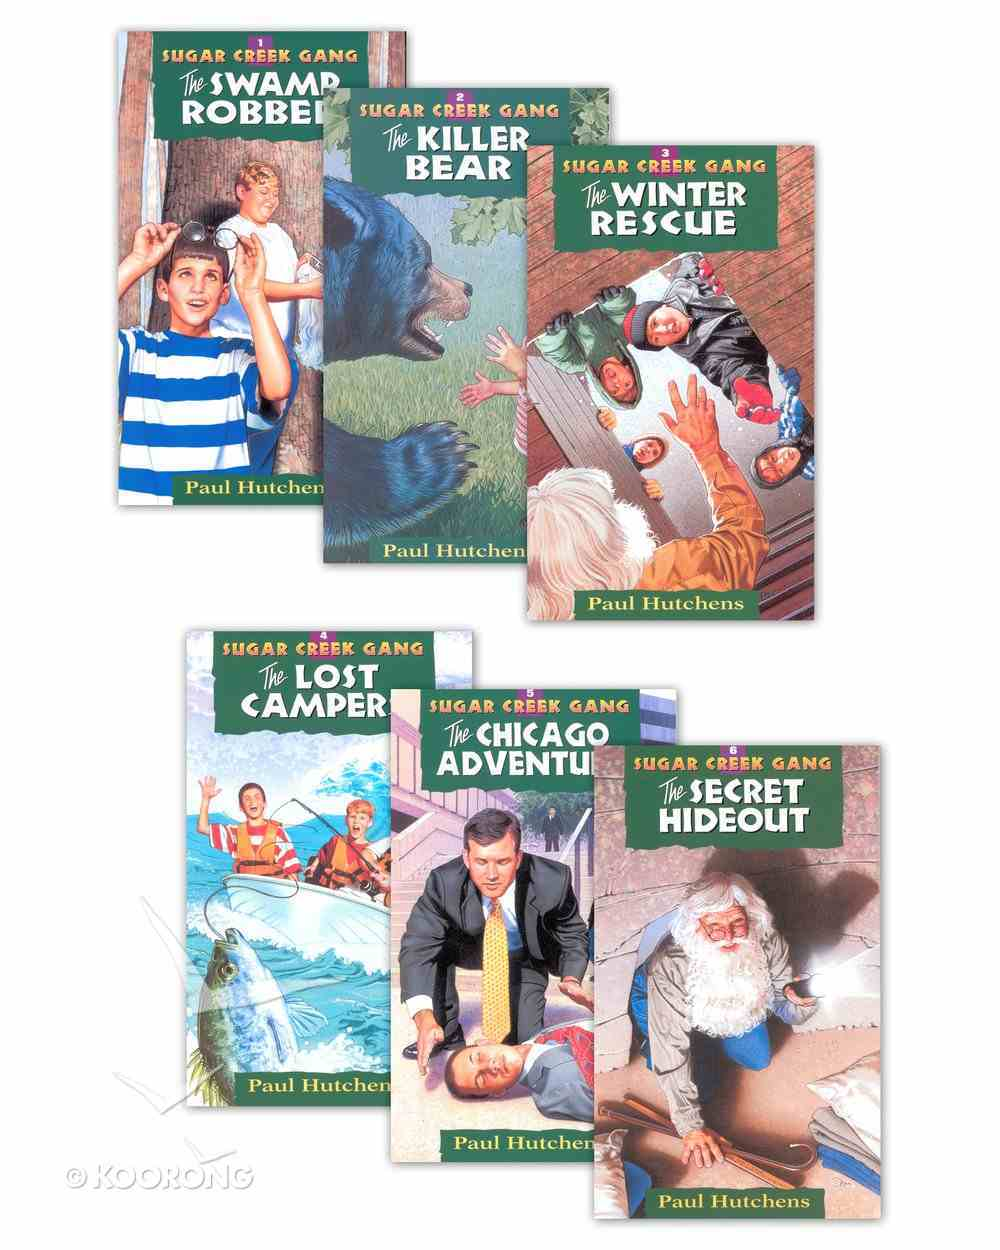 Sugar Creek Gang (1-6) (6 Volume Set) (Sugar Creek Gang Series) eBook